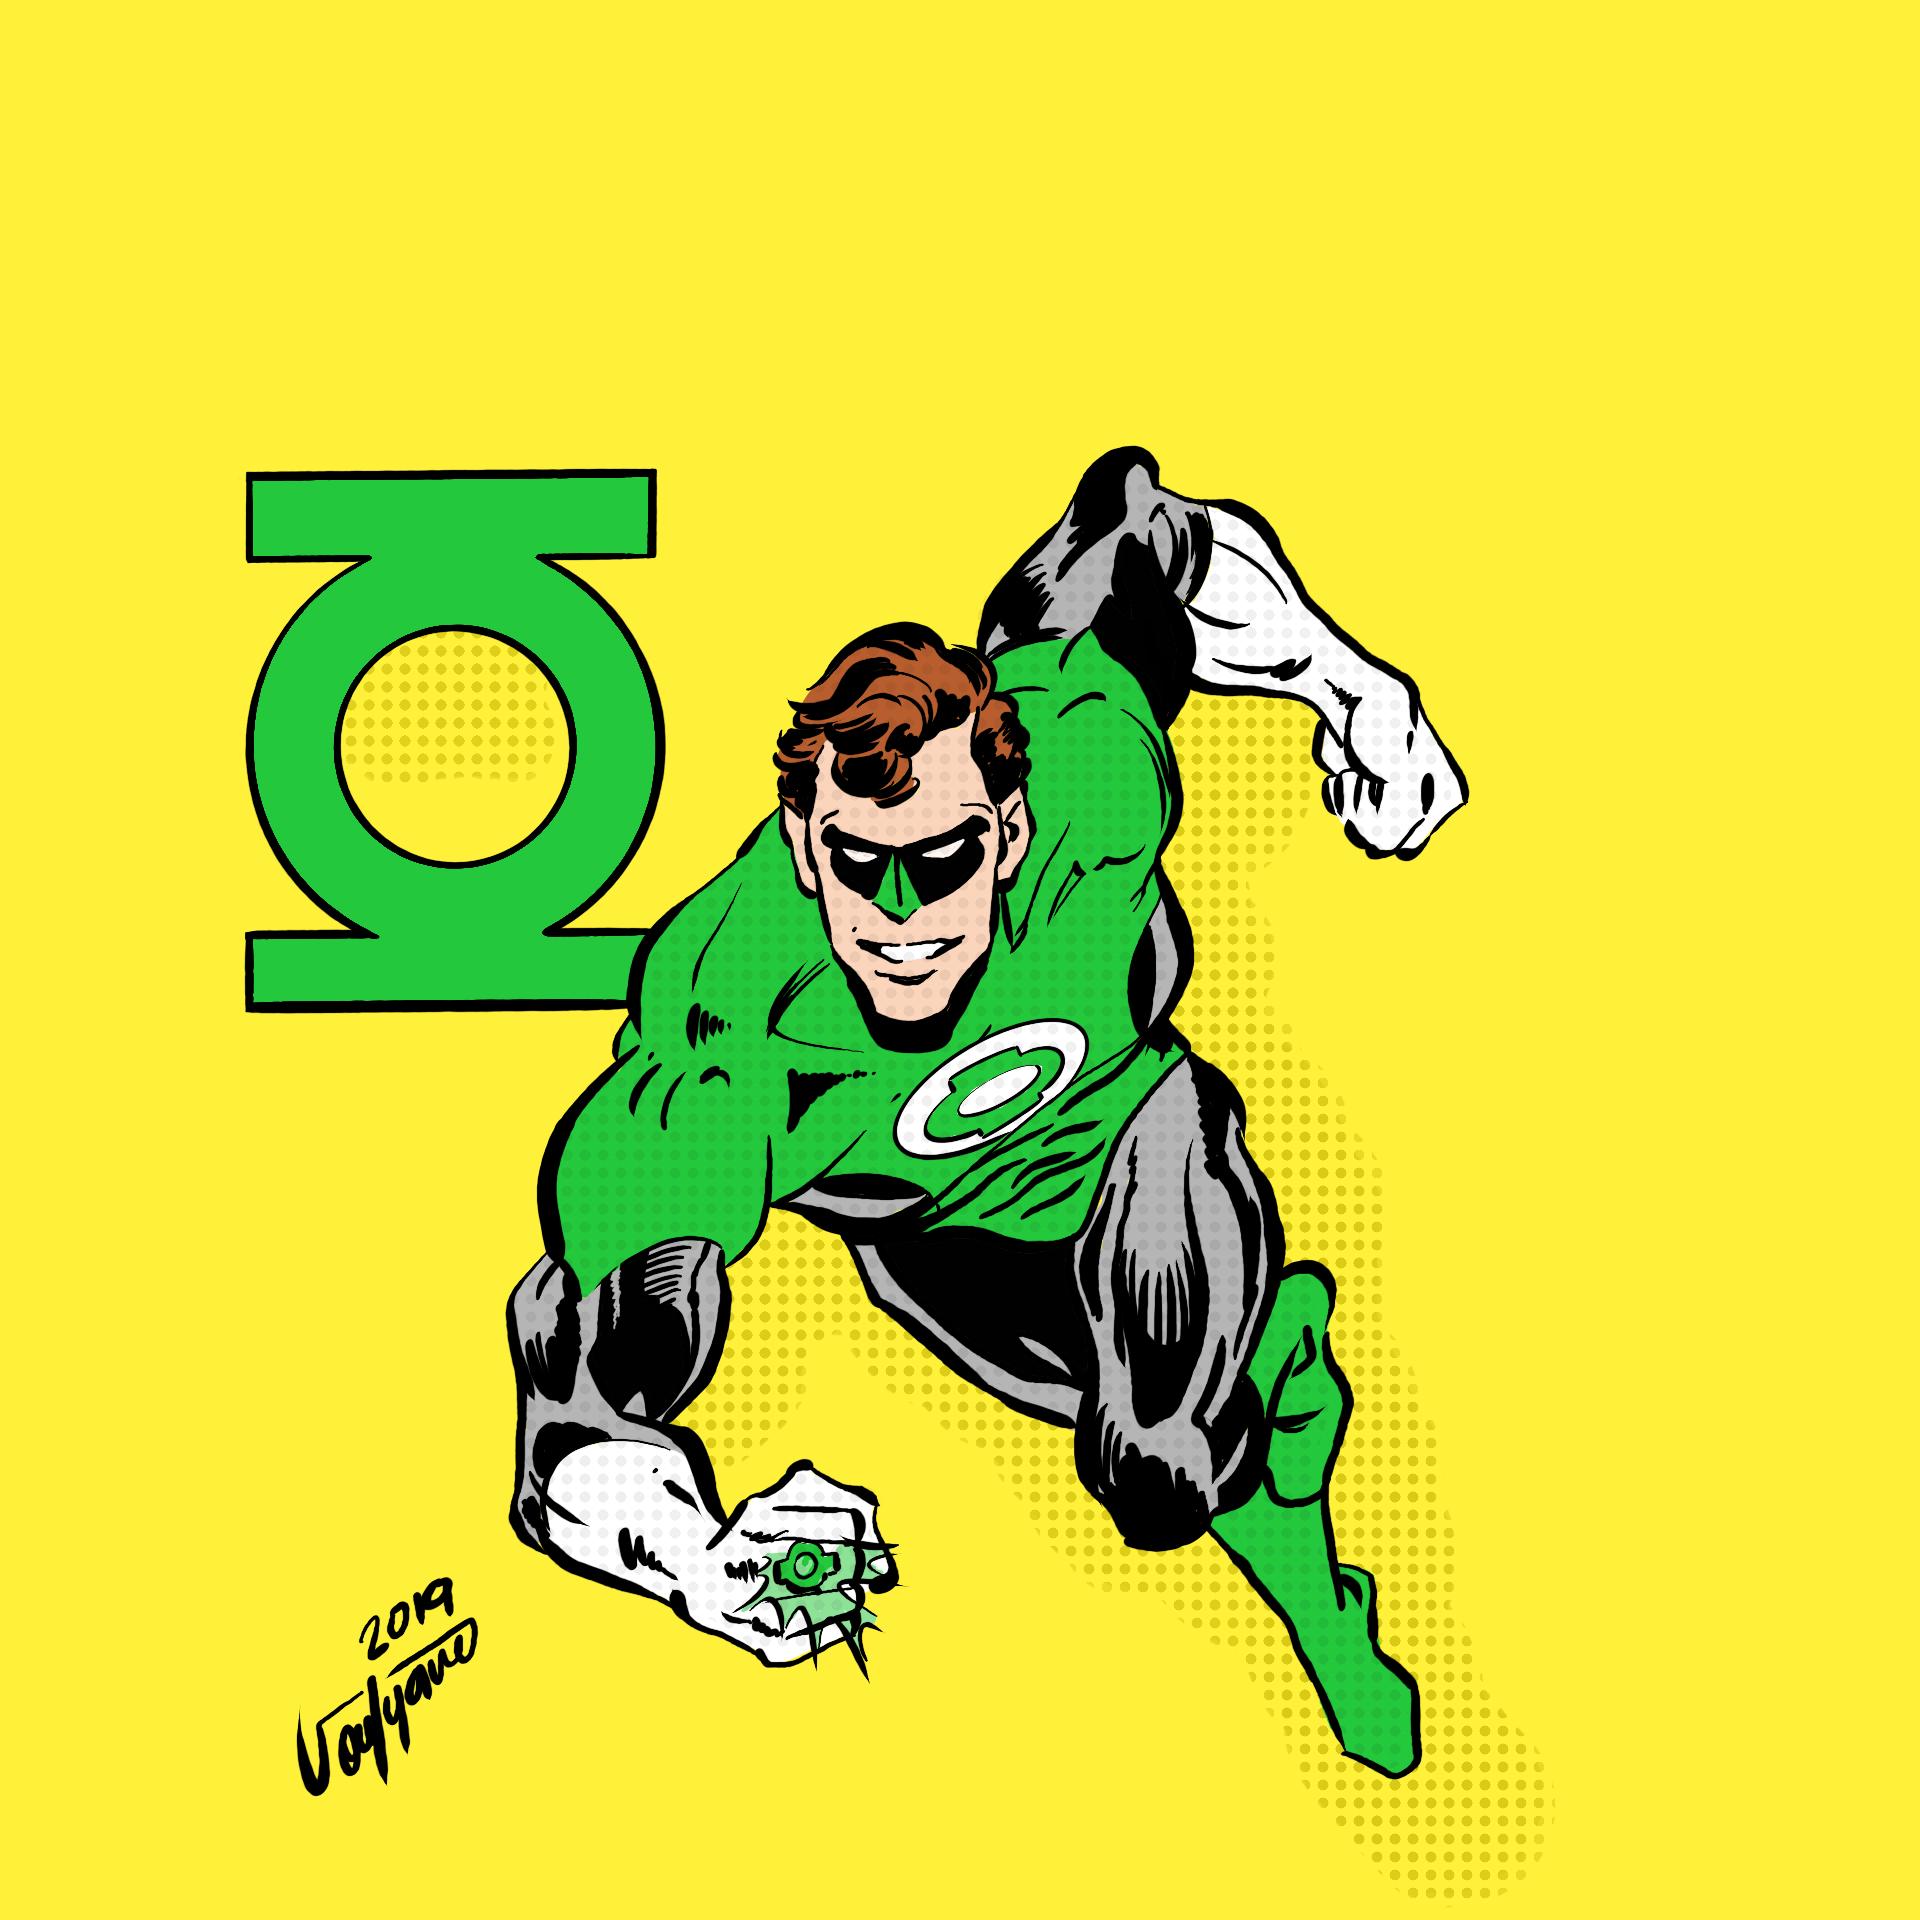 Green Lantern By SoufyaneZ DigitallyDrawing.com